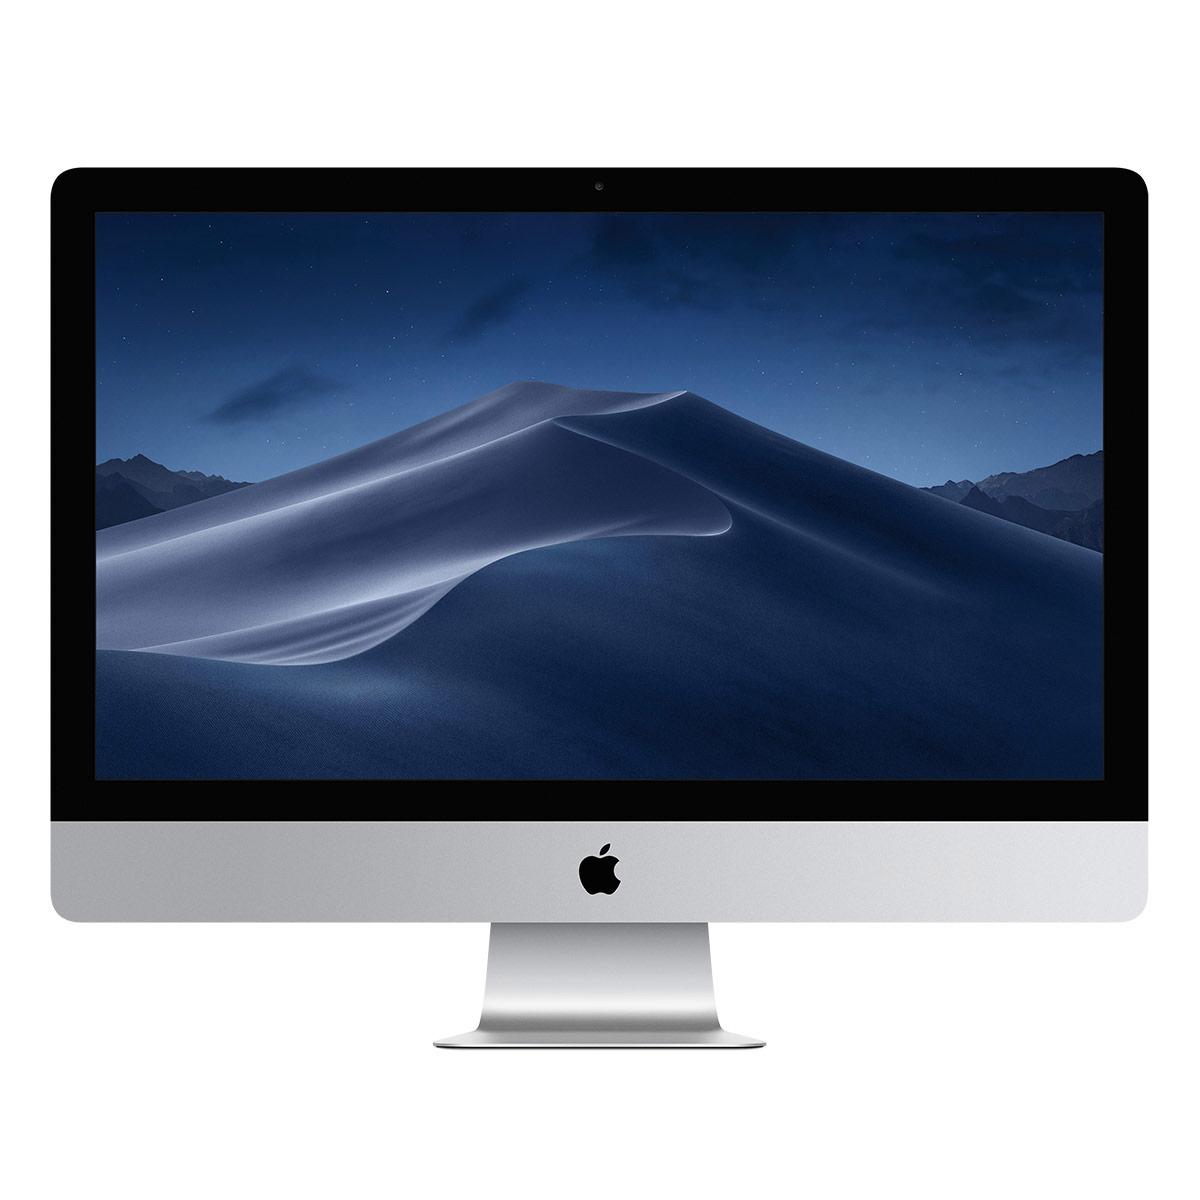 "iMac 27"" Retina 5K 6 Core i5 3.0GHz 8GB 1TB Fusion Radeon Pro 575X 4GB"